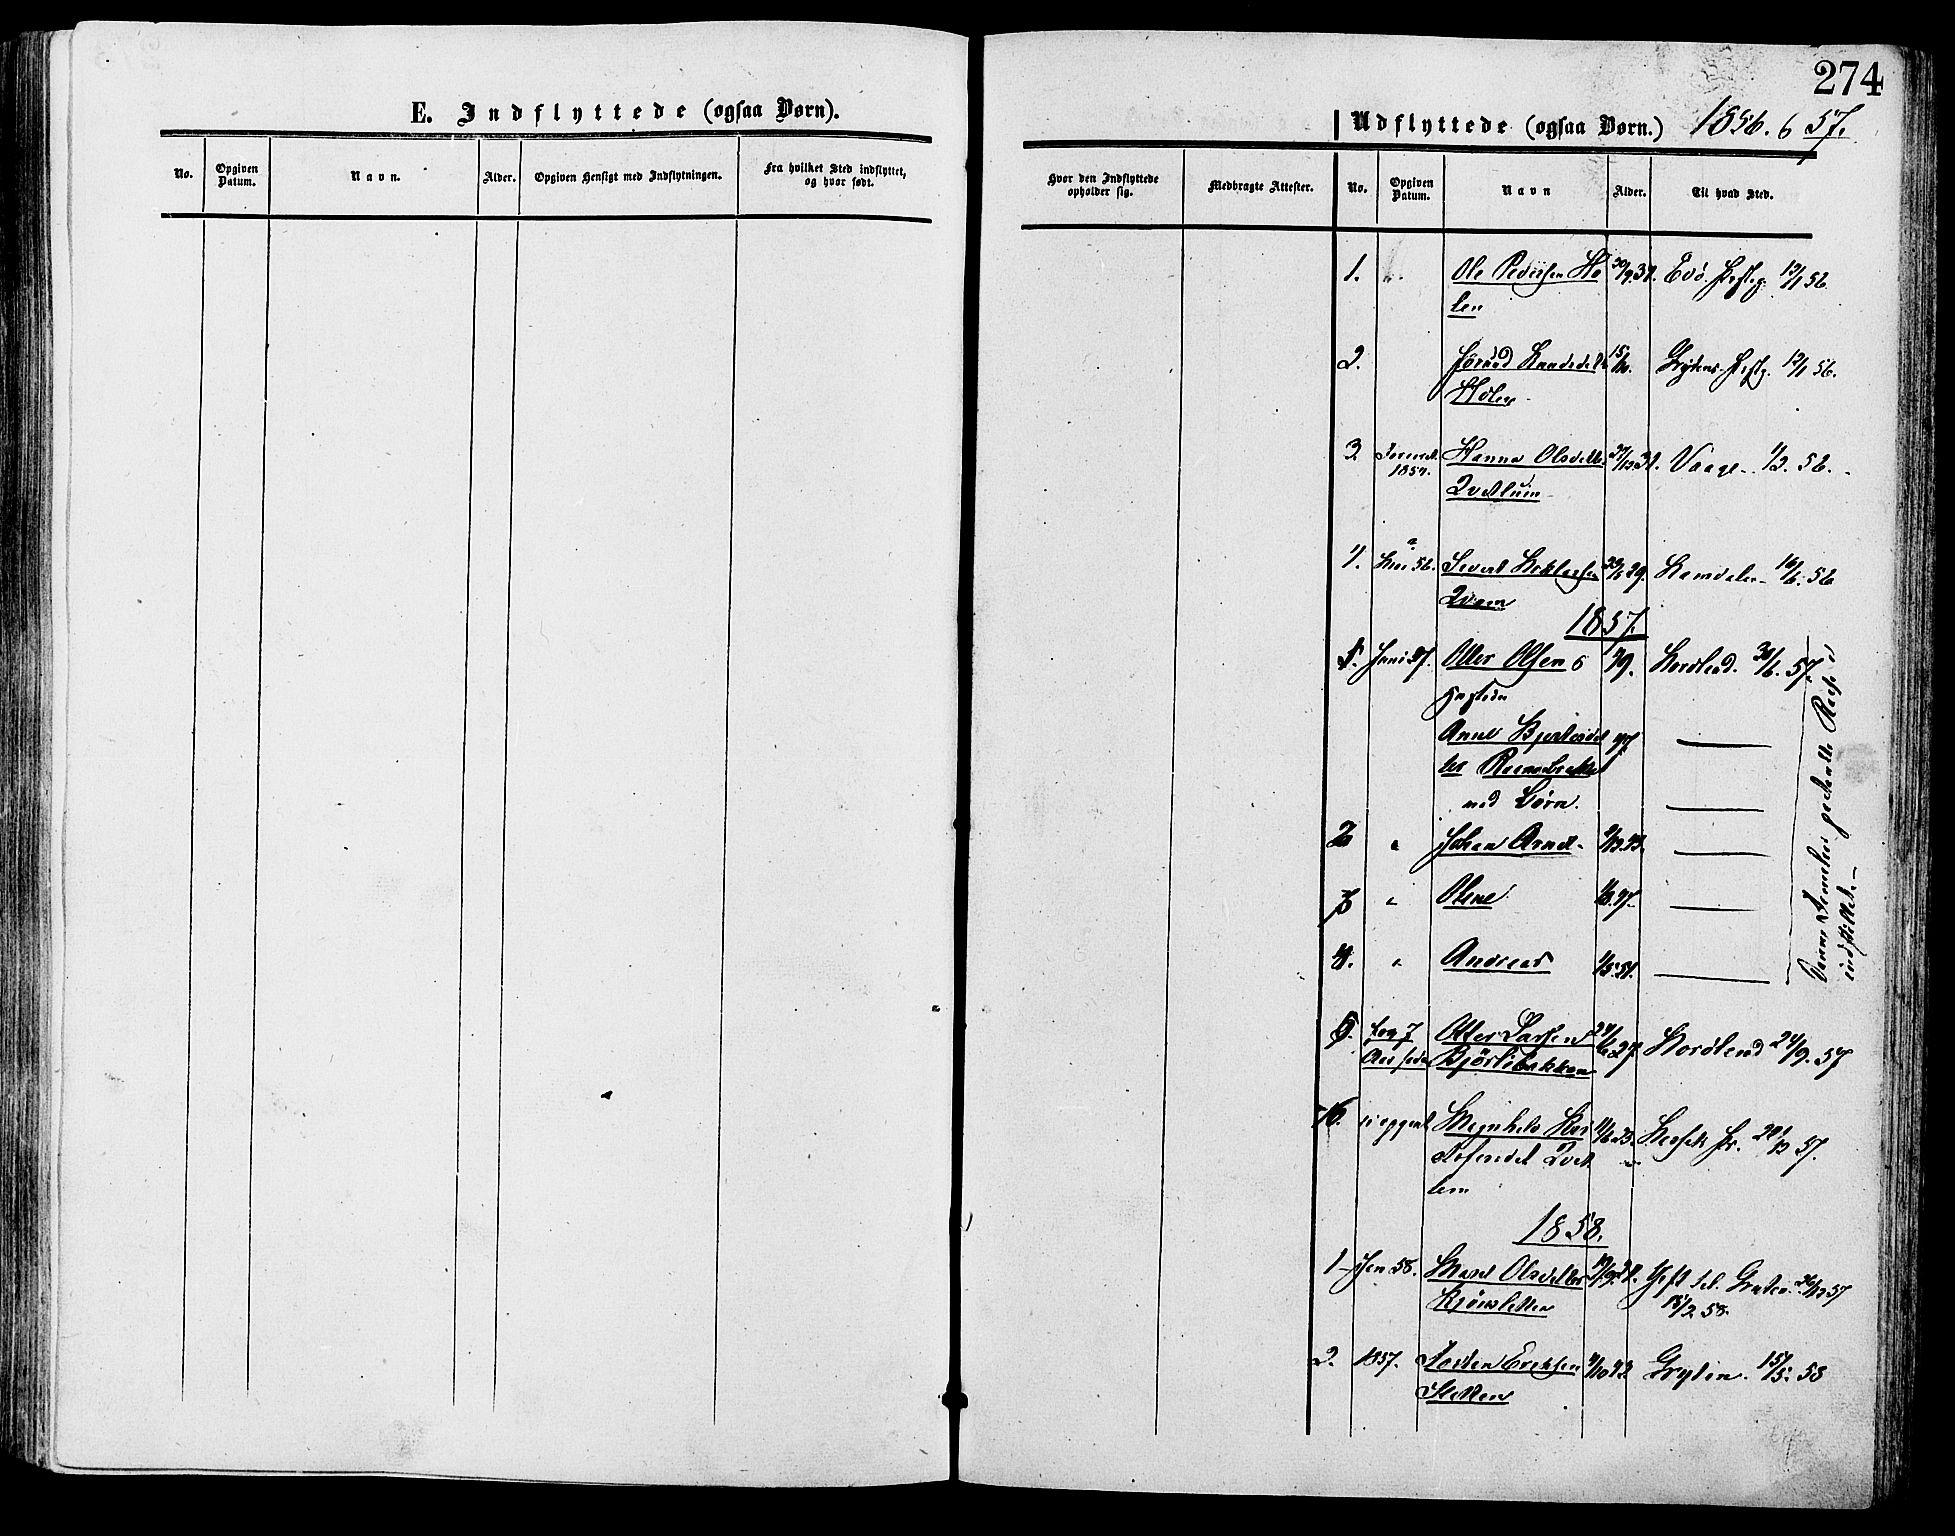 SAH, Lesja prestekontor, Ministerialbok nr. 9, 1854-1889, s. 274